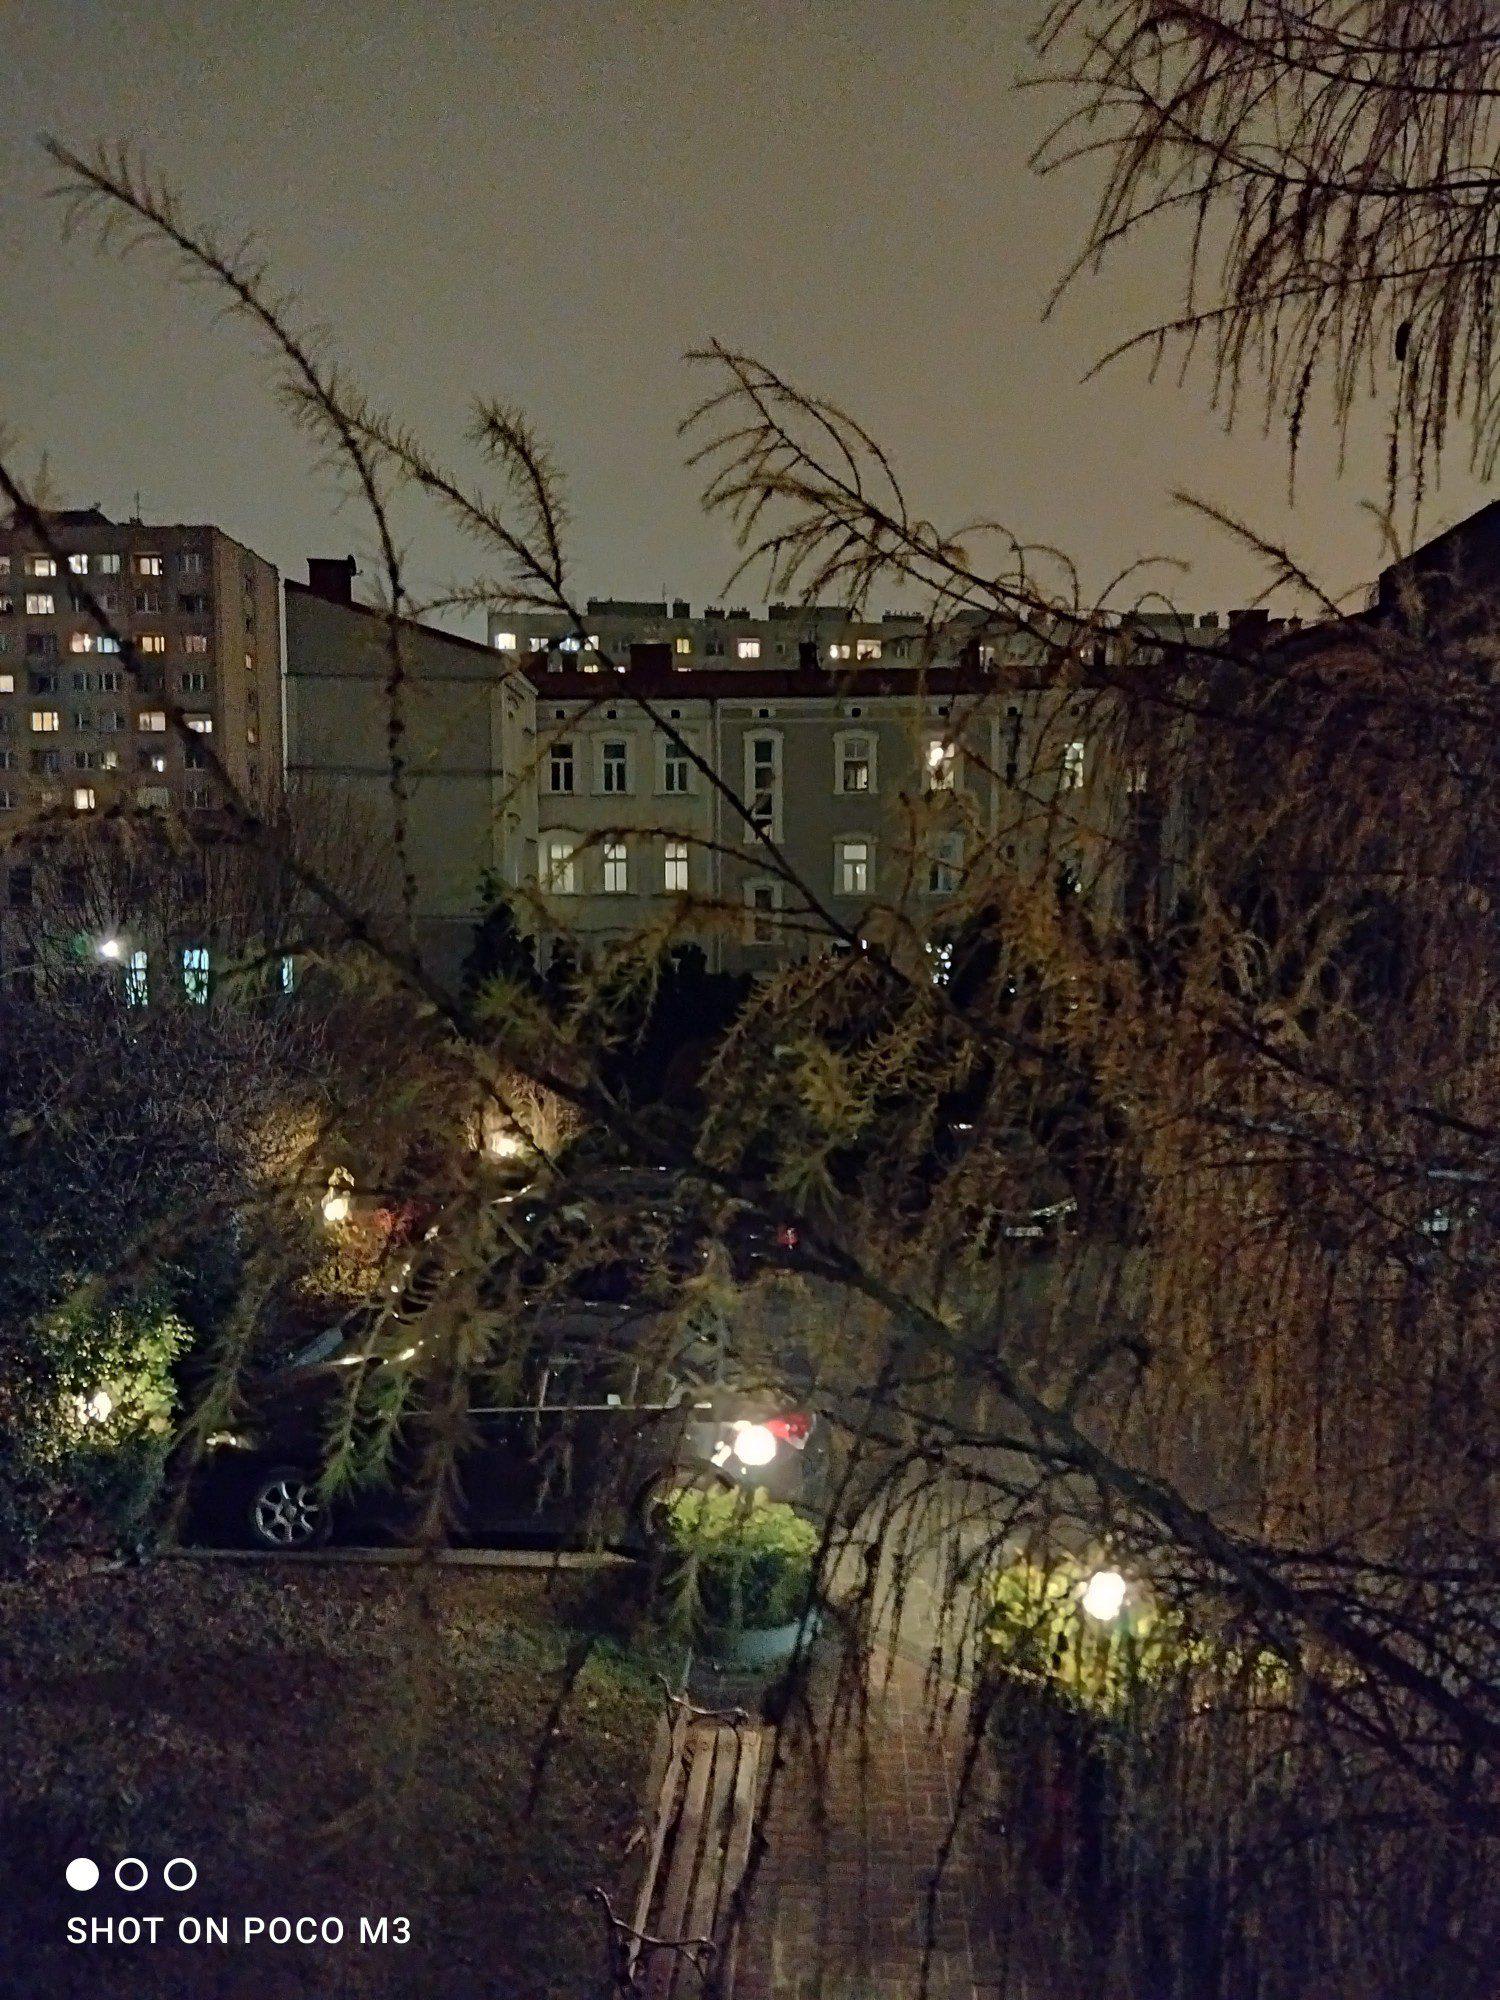 podwórko tryb nocny poco m3